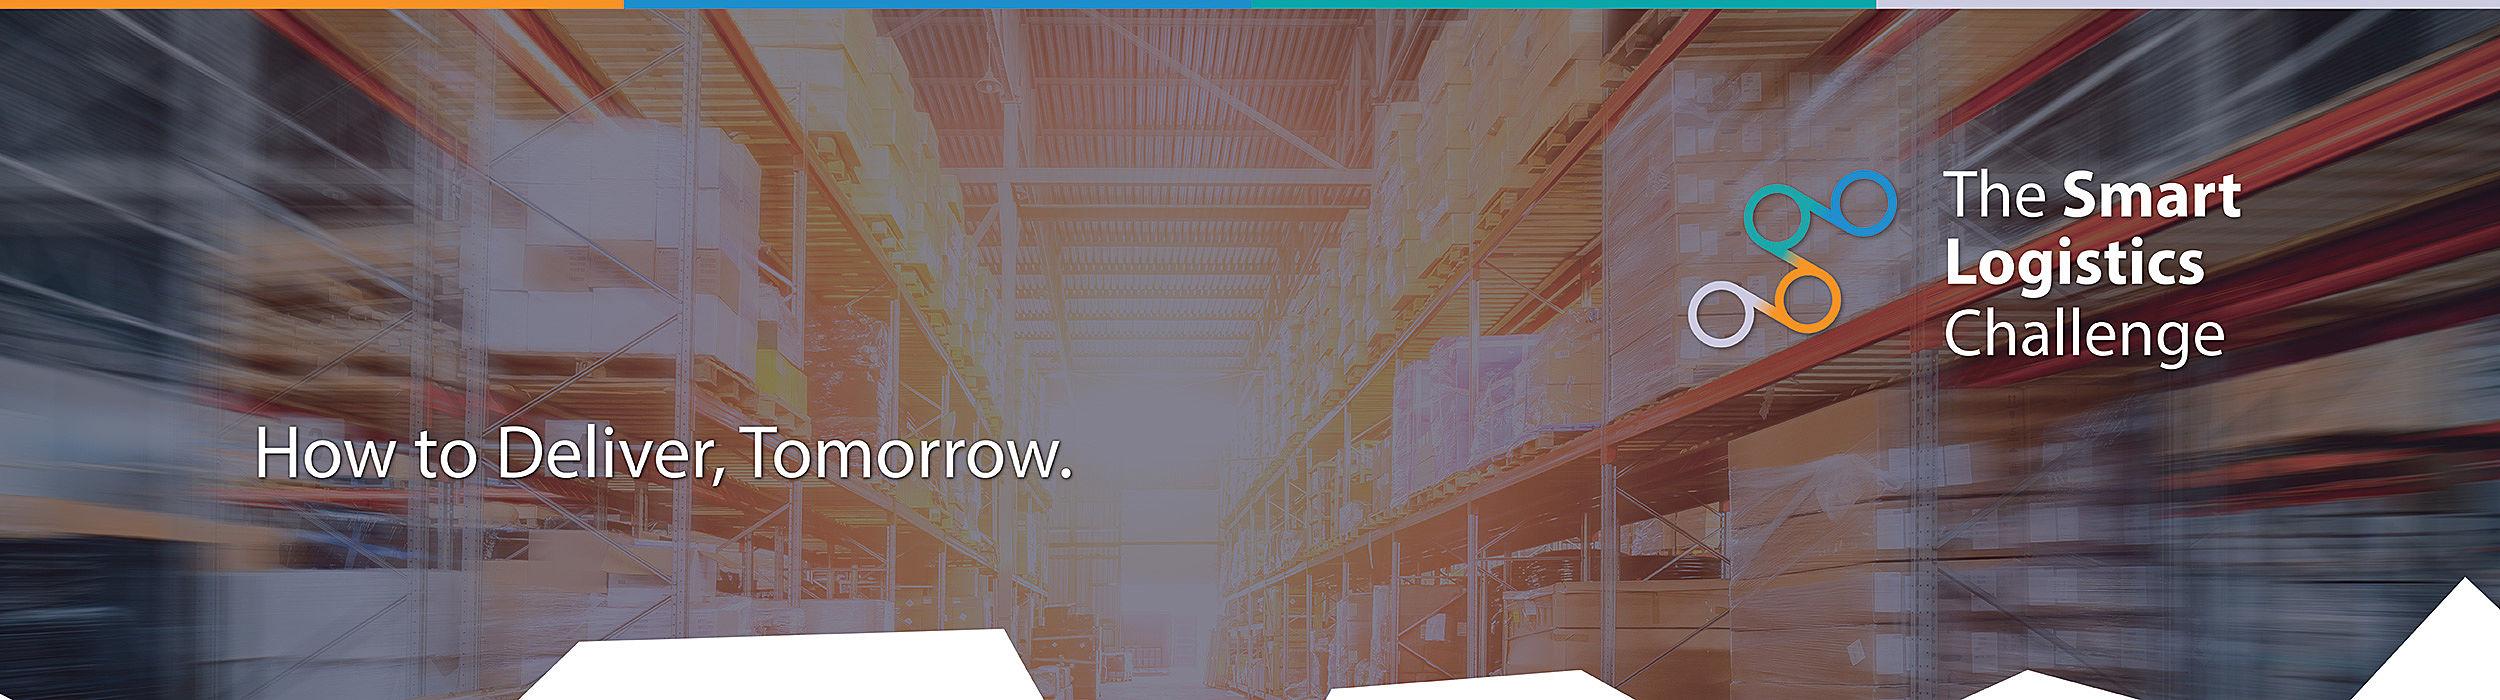 The Smart Logistics Challenge - deliver tomorrow